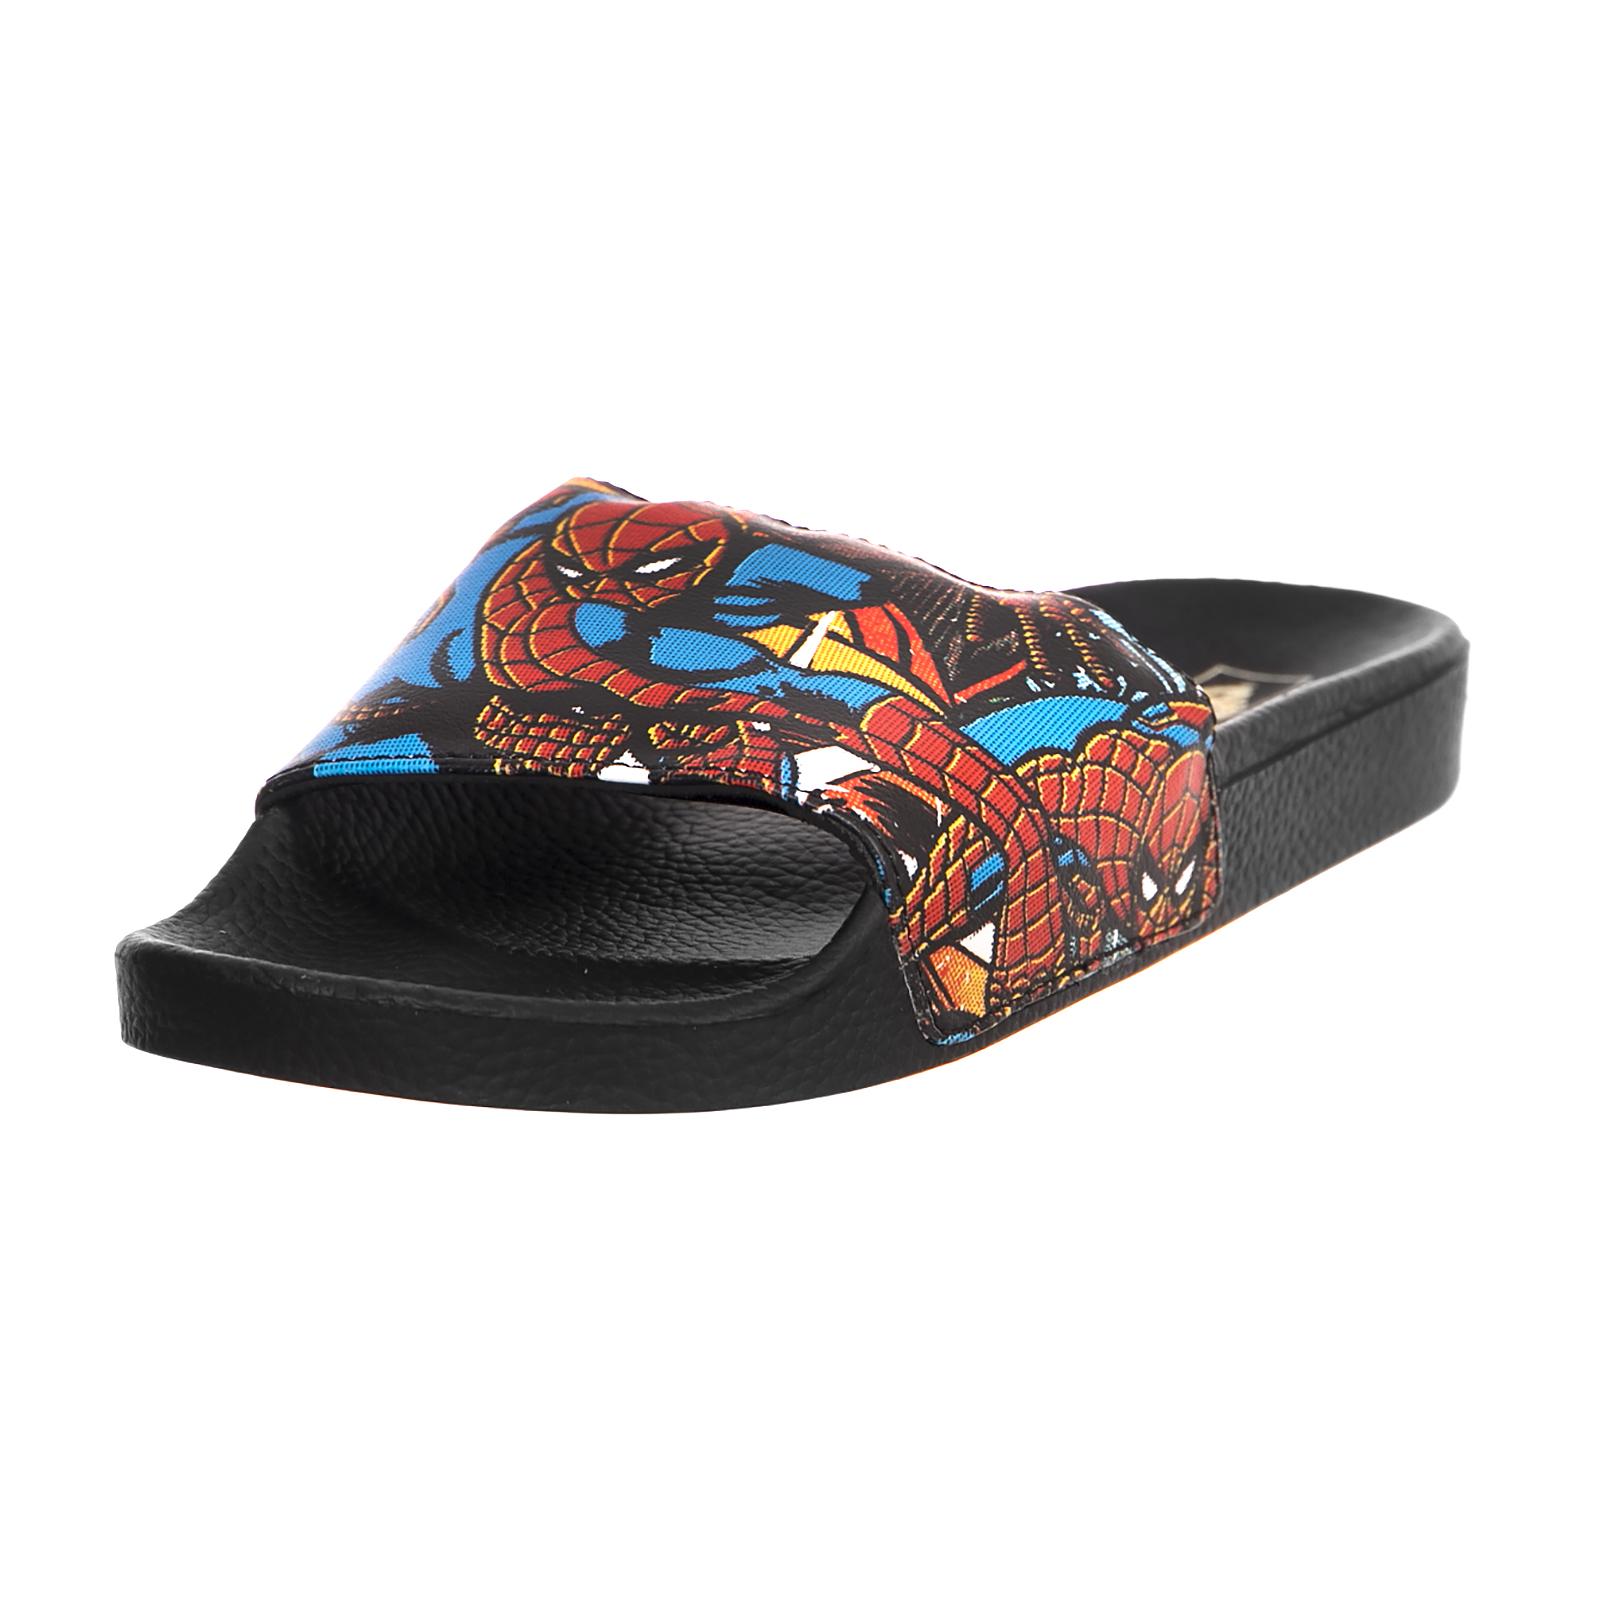 Sandali e scarpe per il mare da uomo Vans Sandali Slide-On Mn Slide-On Sandali (Marvel) Spi Nero b62980